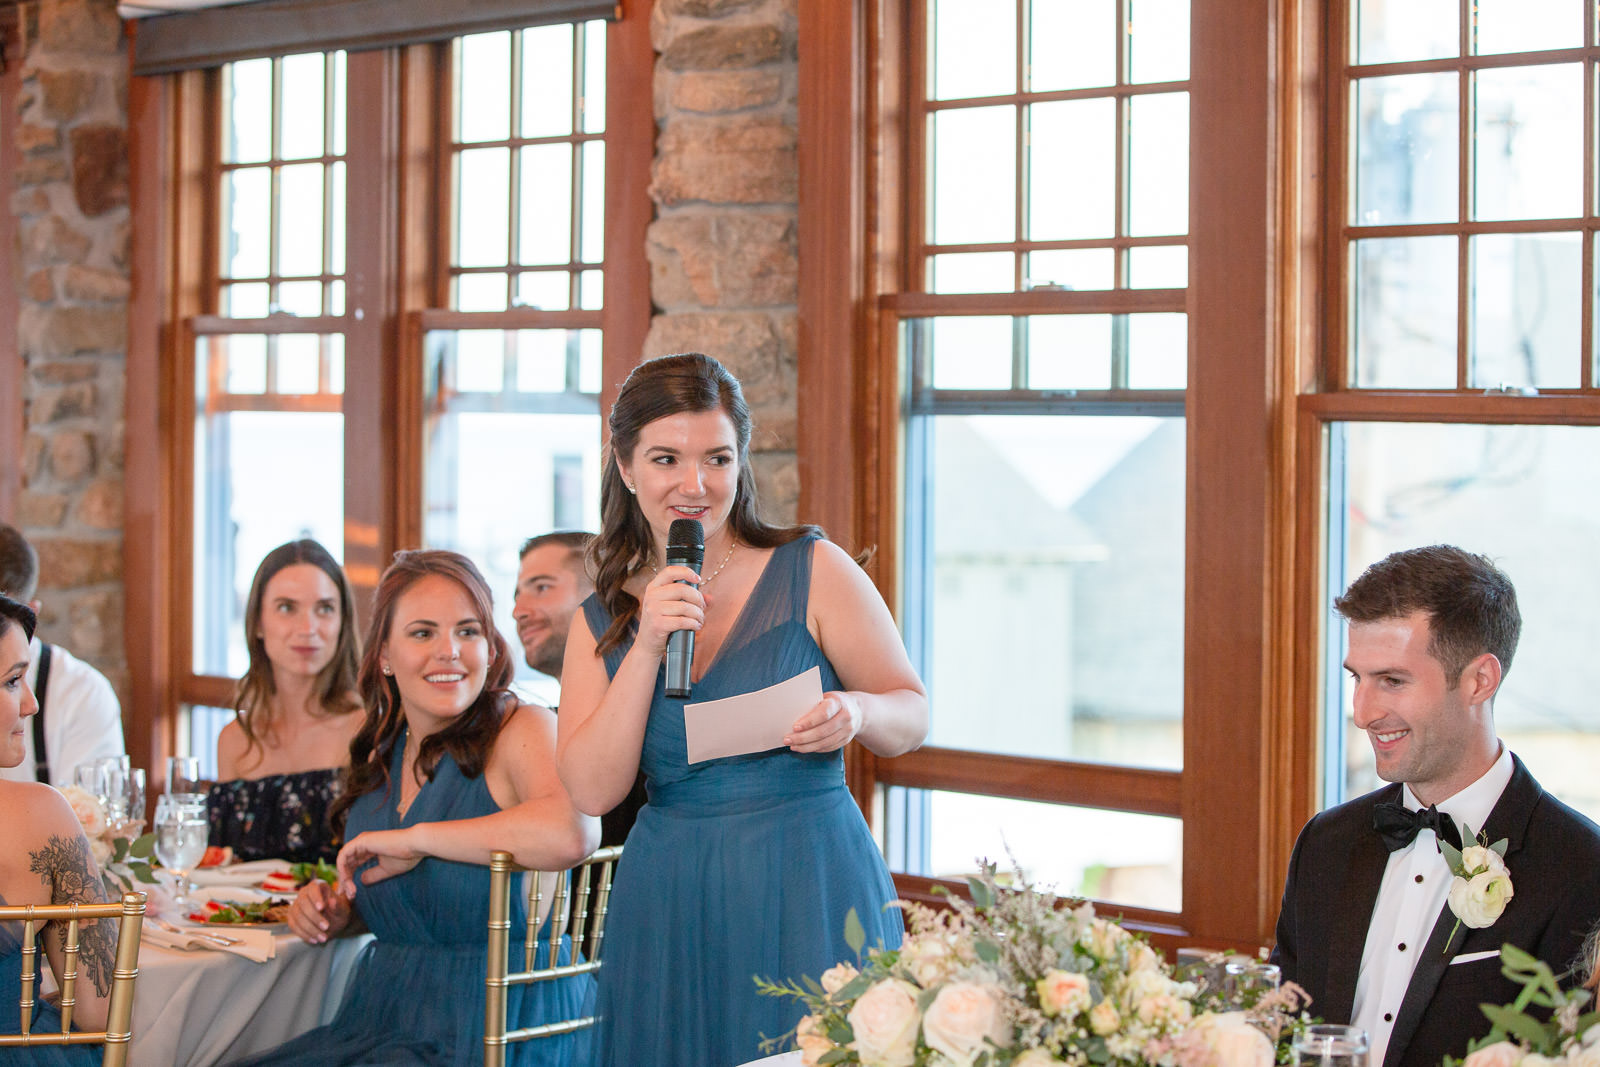 Wedding, Narragansett Towers, The Towers, Narragansett, Rhode Island, RI, Tracy Jenkins photography, RI wedding photographer, Rhode Island wedding photographer, wedding reception, toast